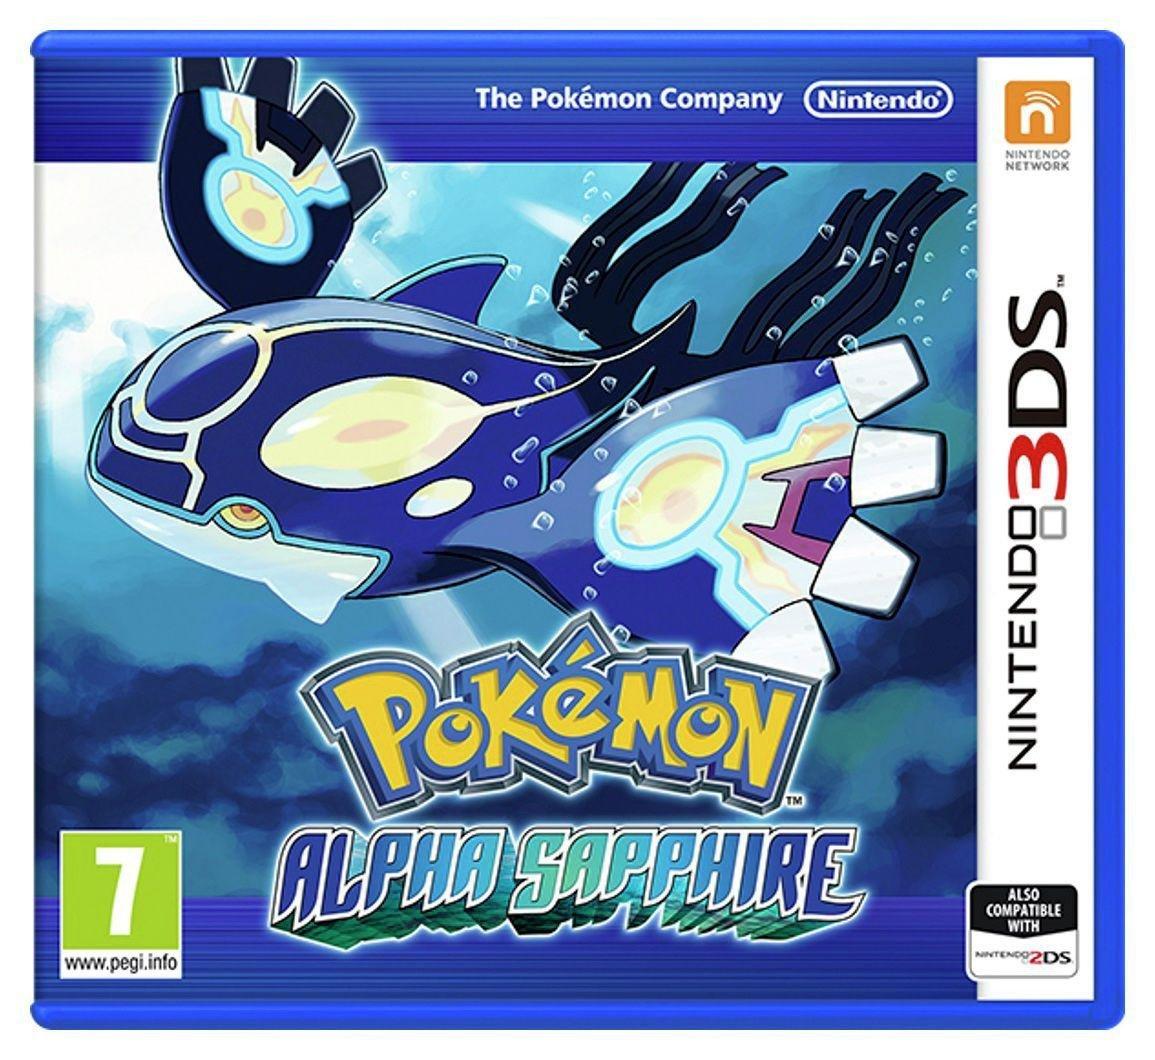 Nintendo Pokemon - Alpha Sapphire - 3DS Game